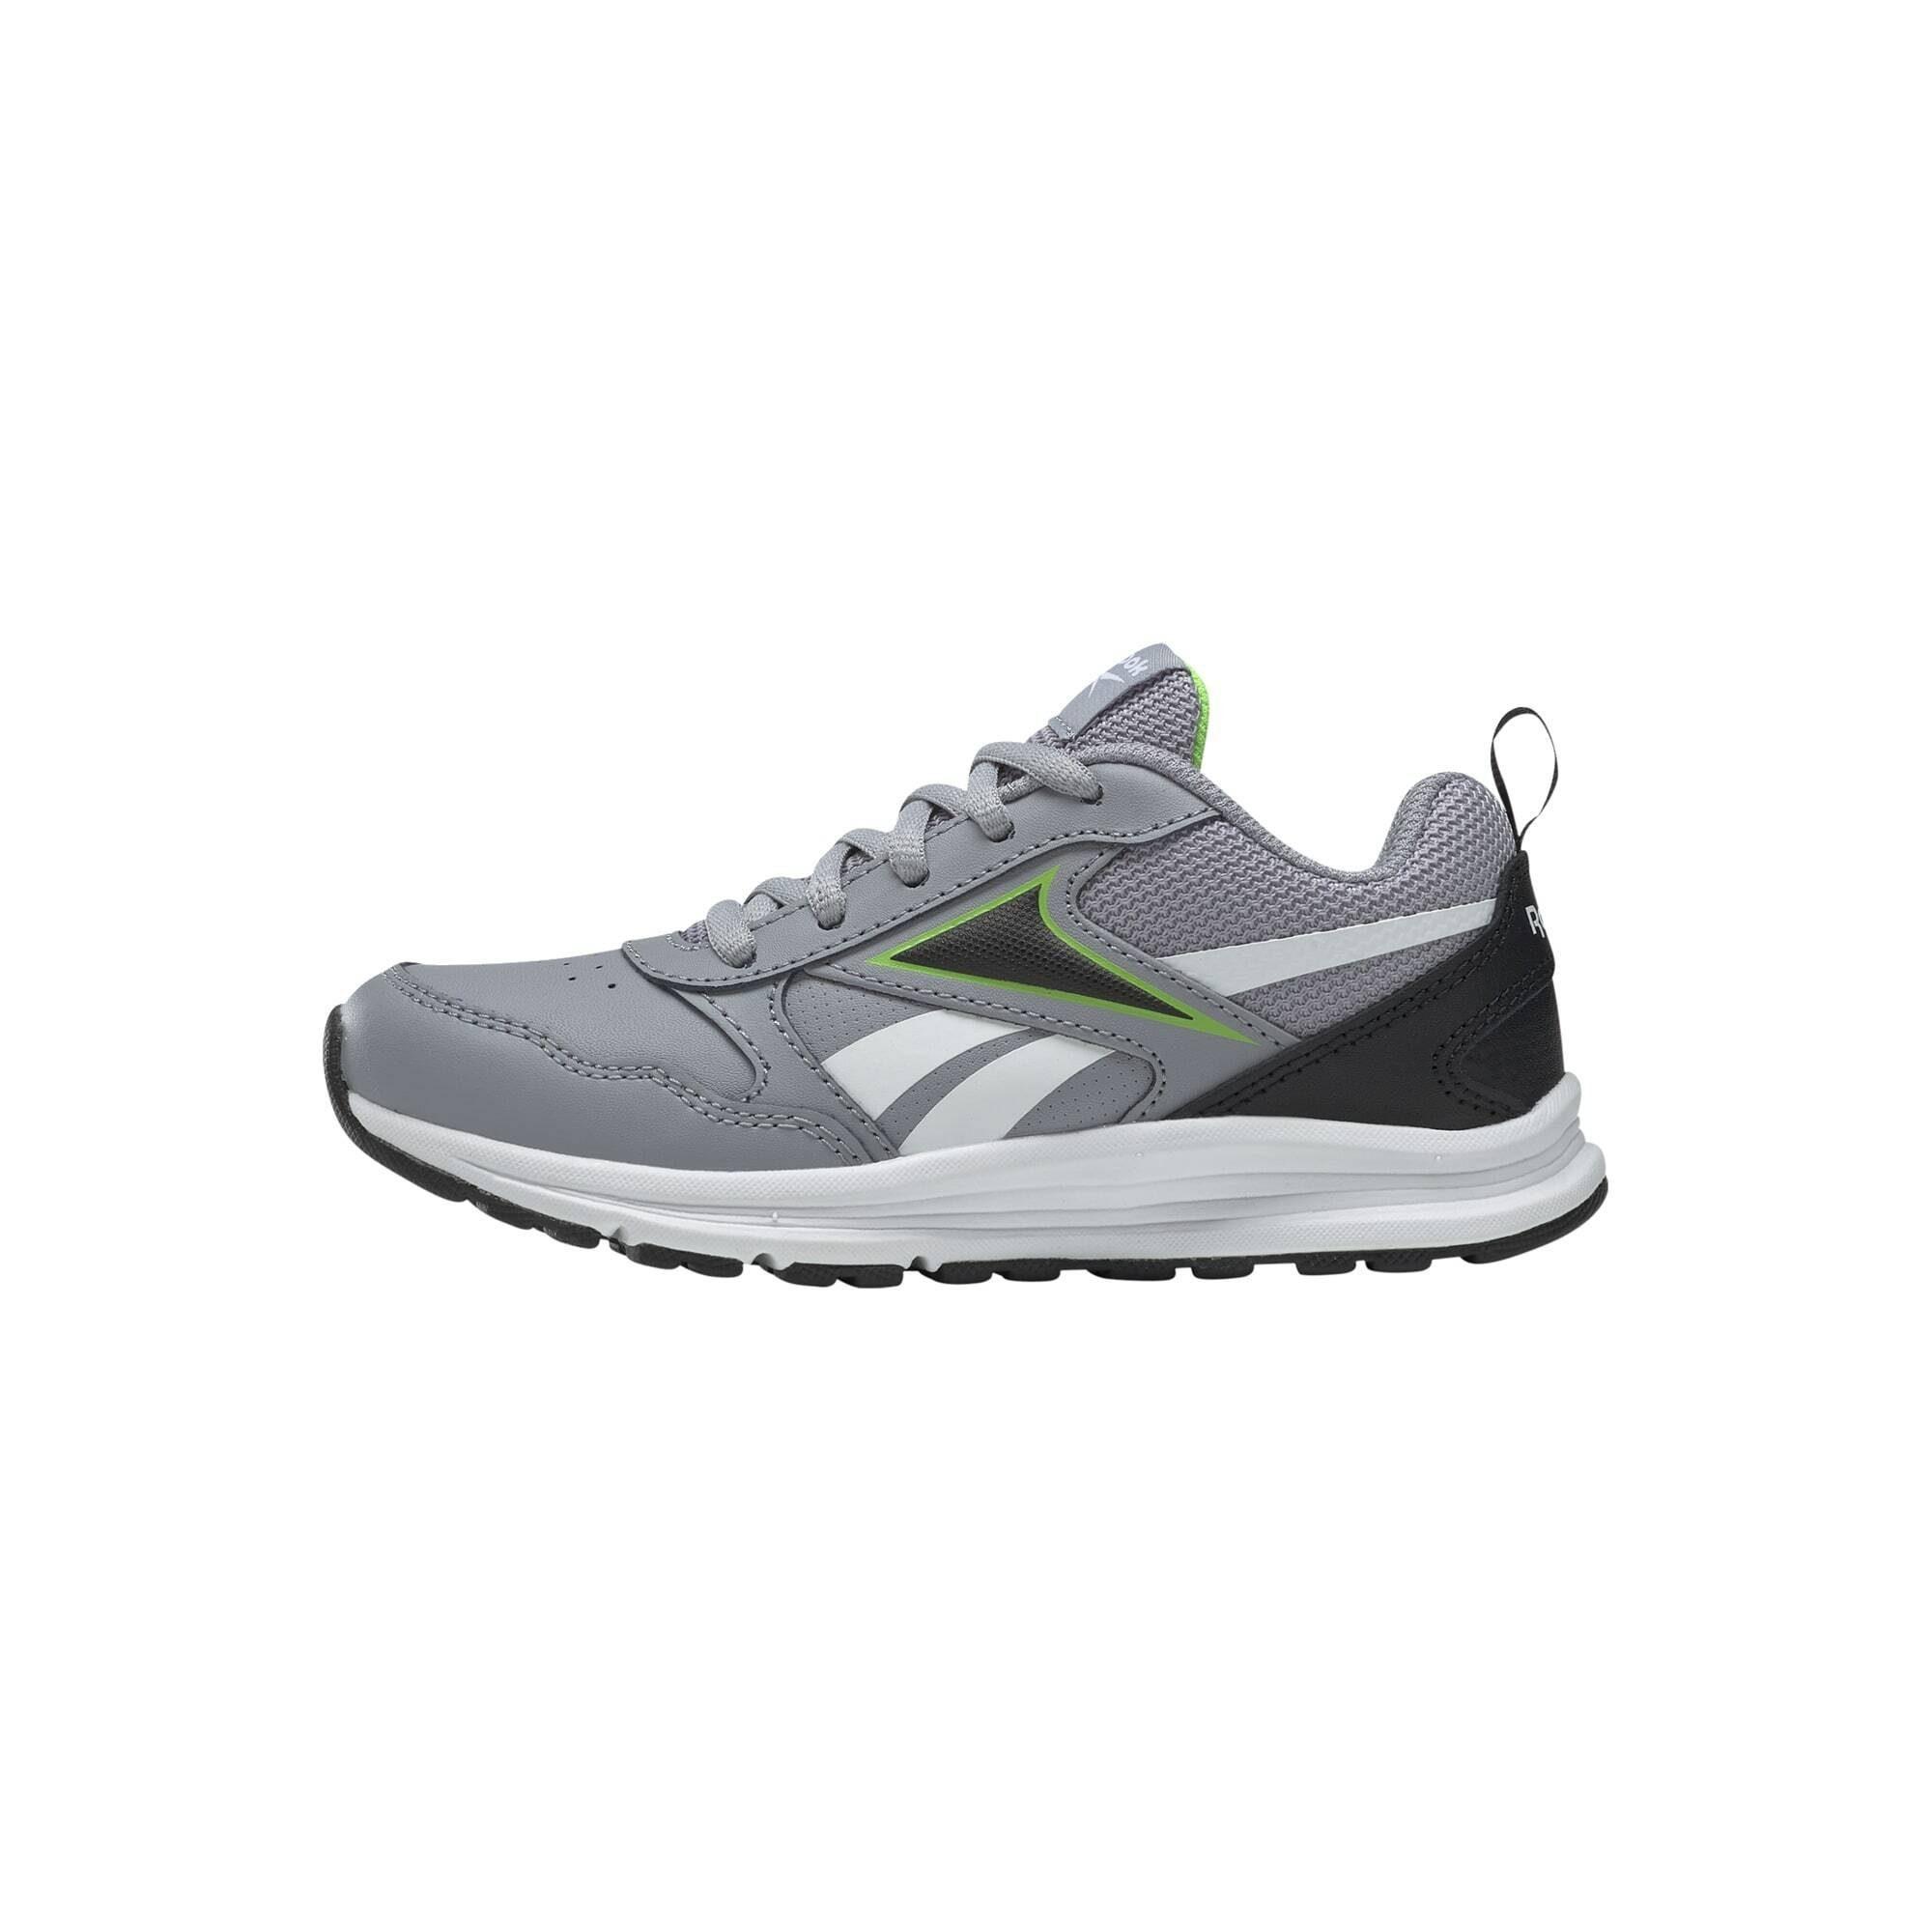 Reebok »Reebok Almotio 5.0 Shoes« Trainingsschuh | OTTO